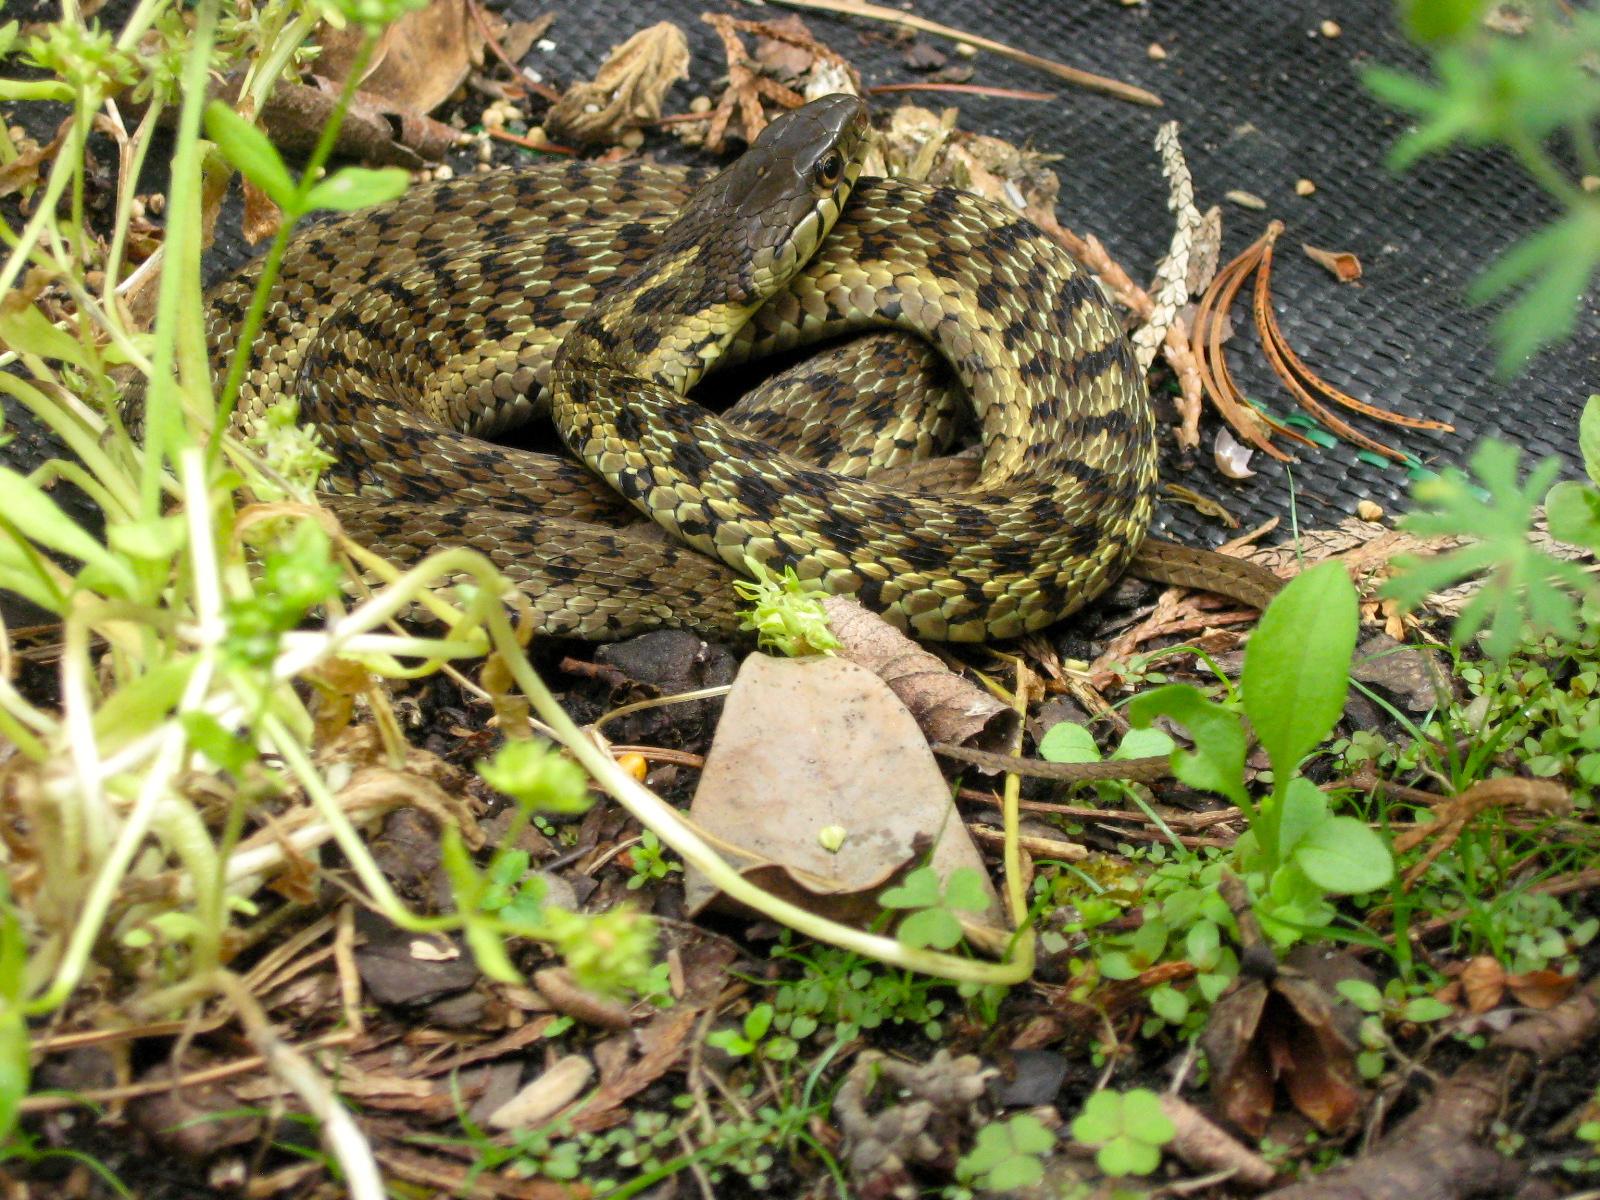 Retired in Delaware: Snakes